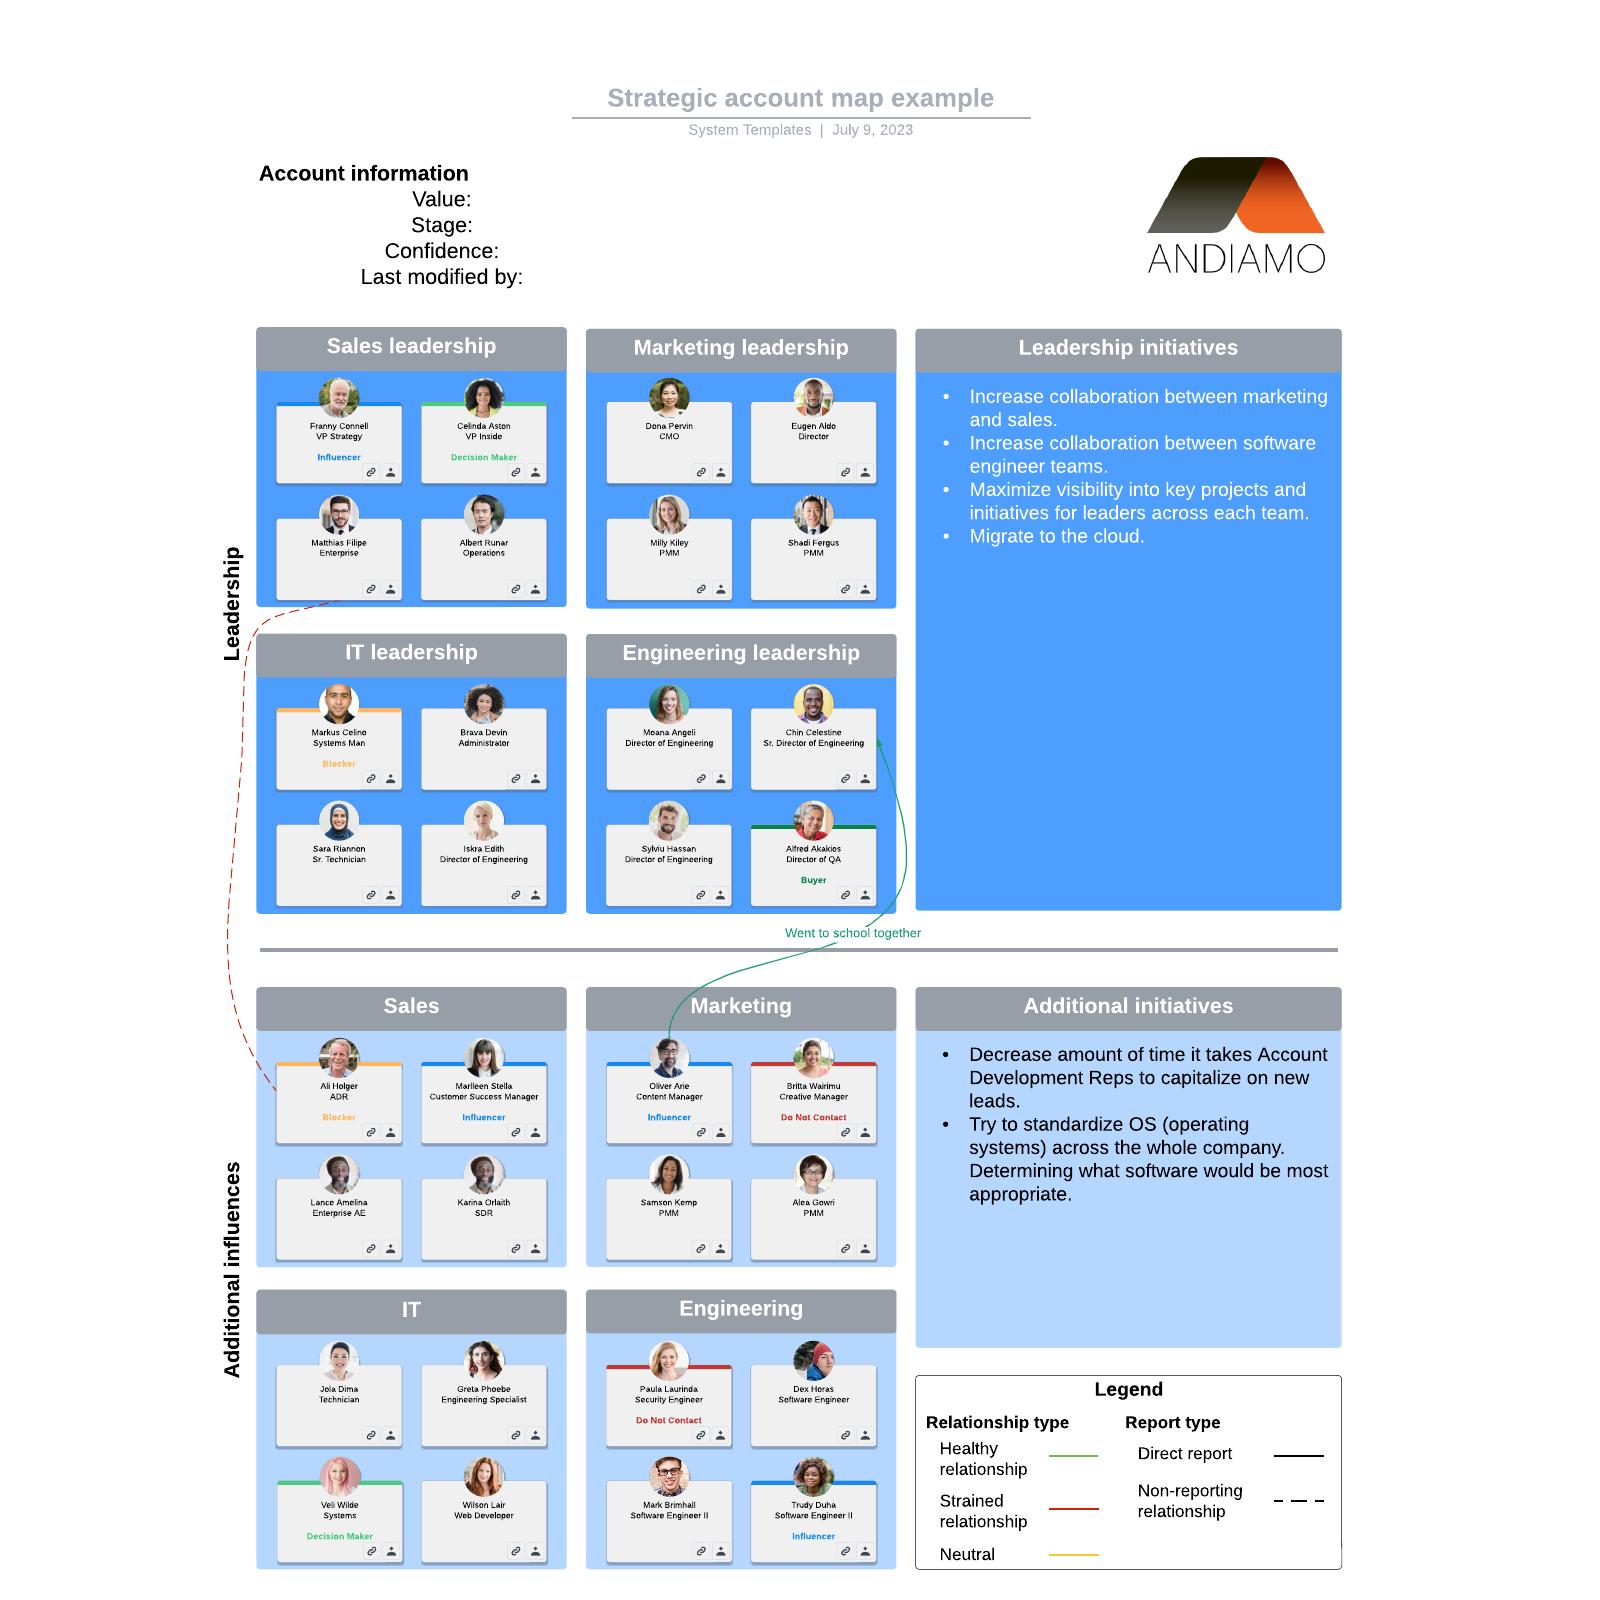 Strategic account map example